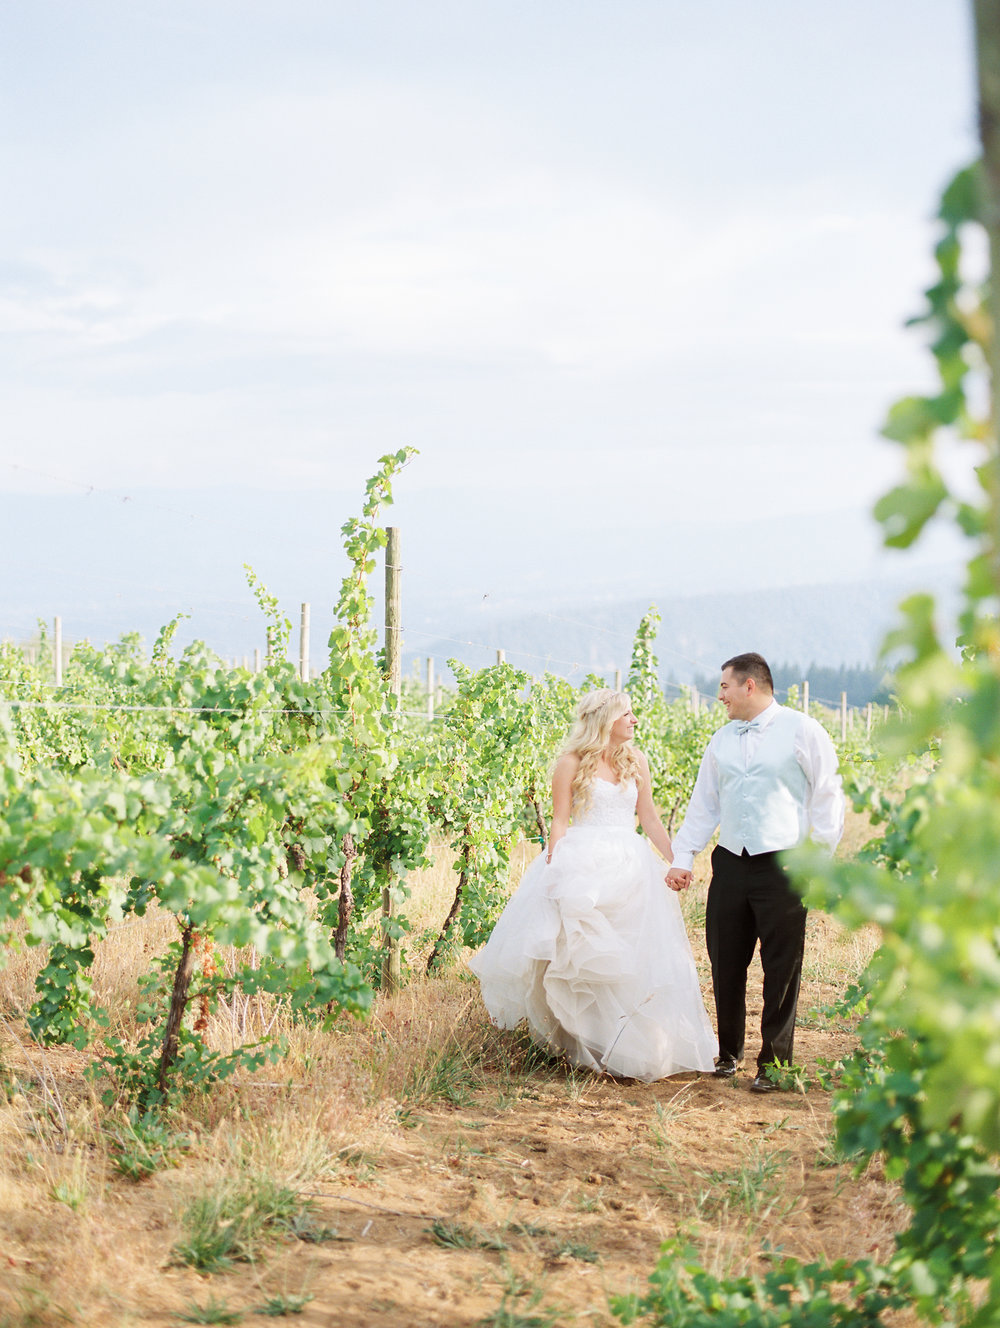 Kristina-Tyler-Wedding-Sunset-10.jpg